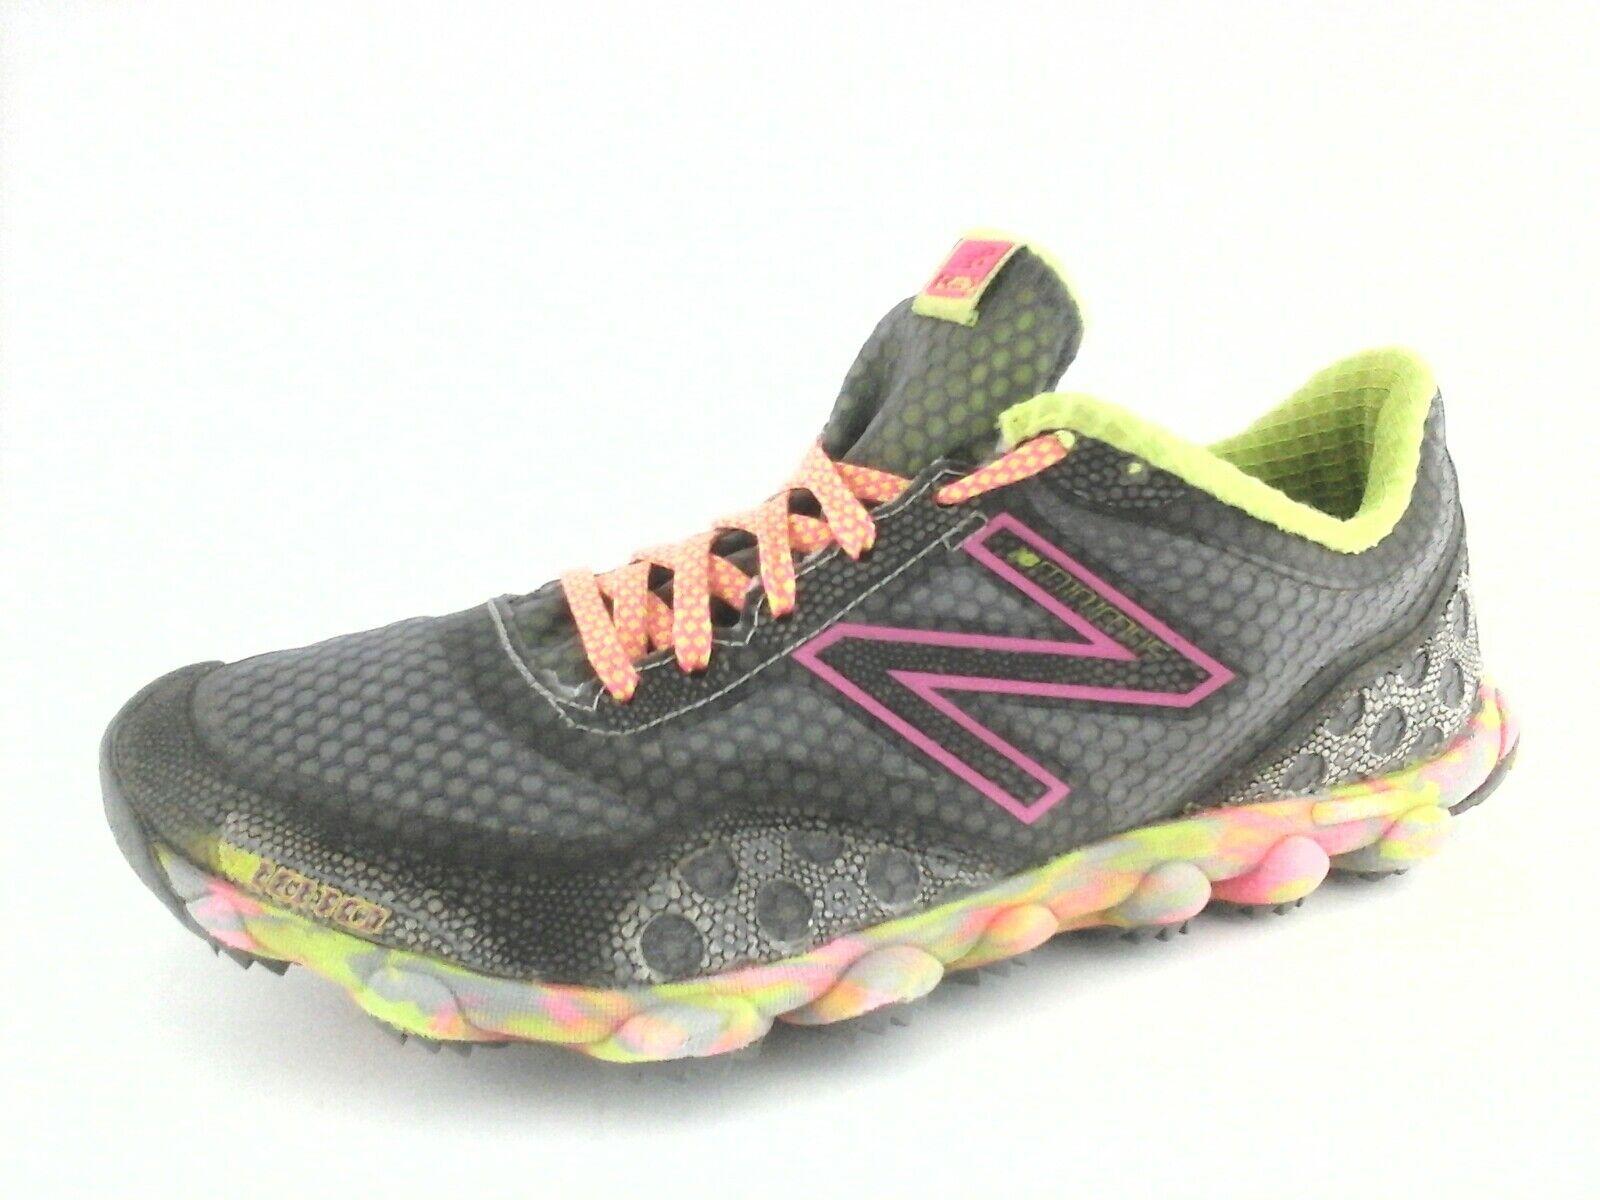 c2c66cd0bd55 NEW BALANCE MINIMUS Sneakers GRAY CAMO Running Shoes Womens US 6   36.5 New